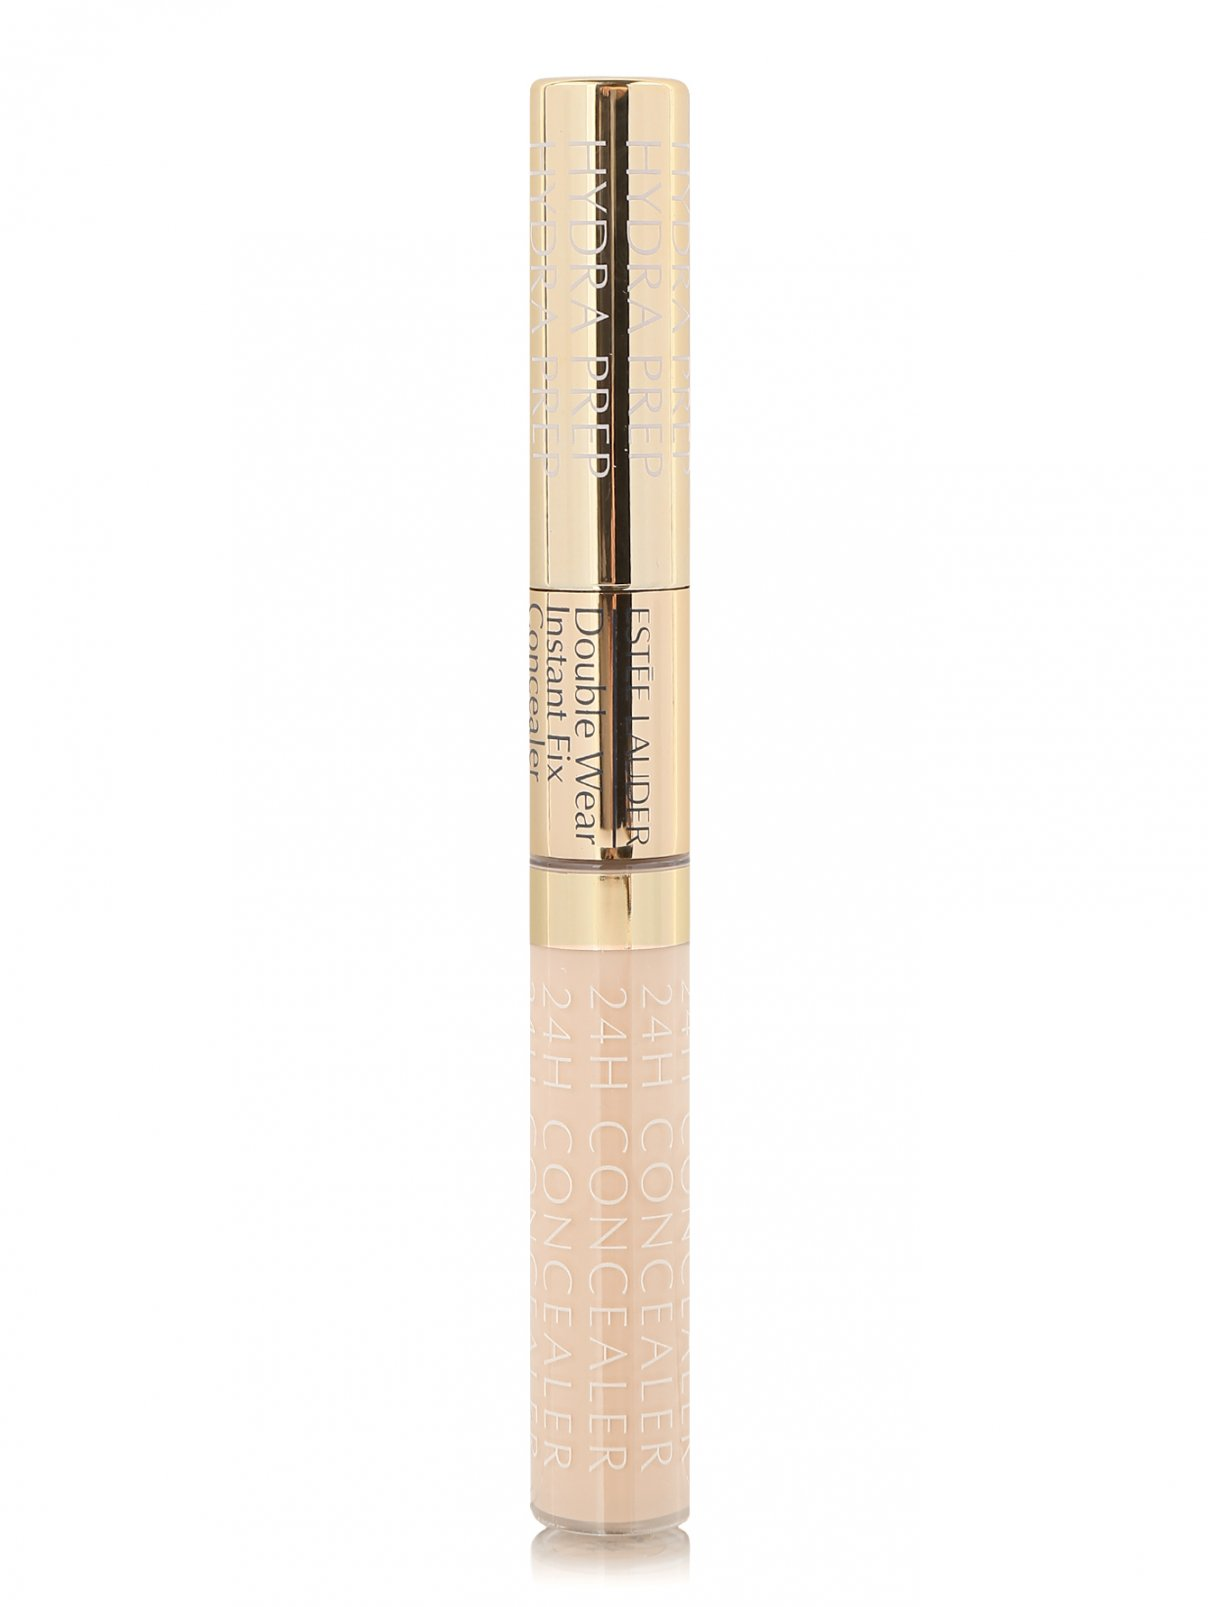 Консилер + праймер 2C Light Medium Double Wear Estee Lauder  –  Общий вид